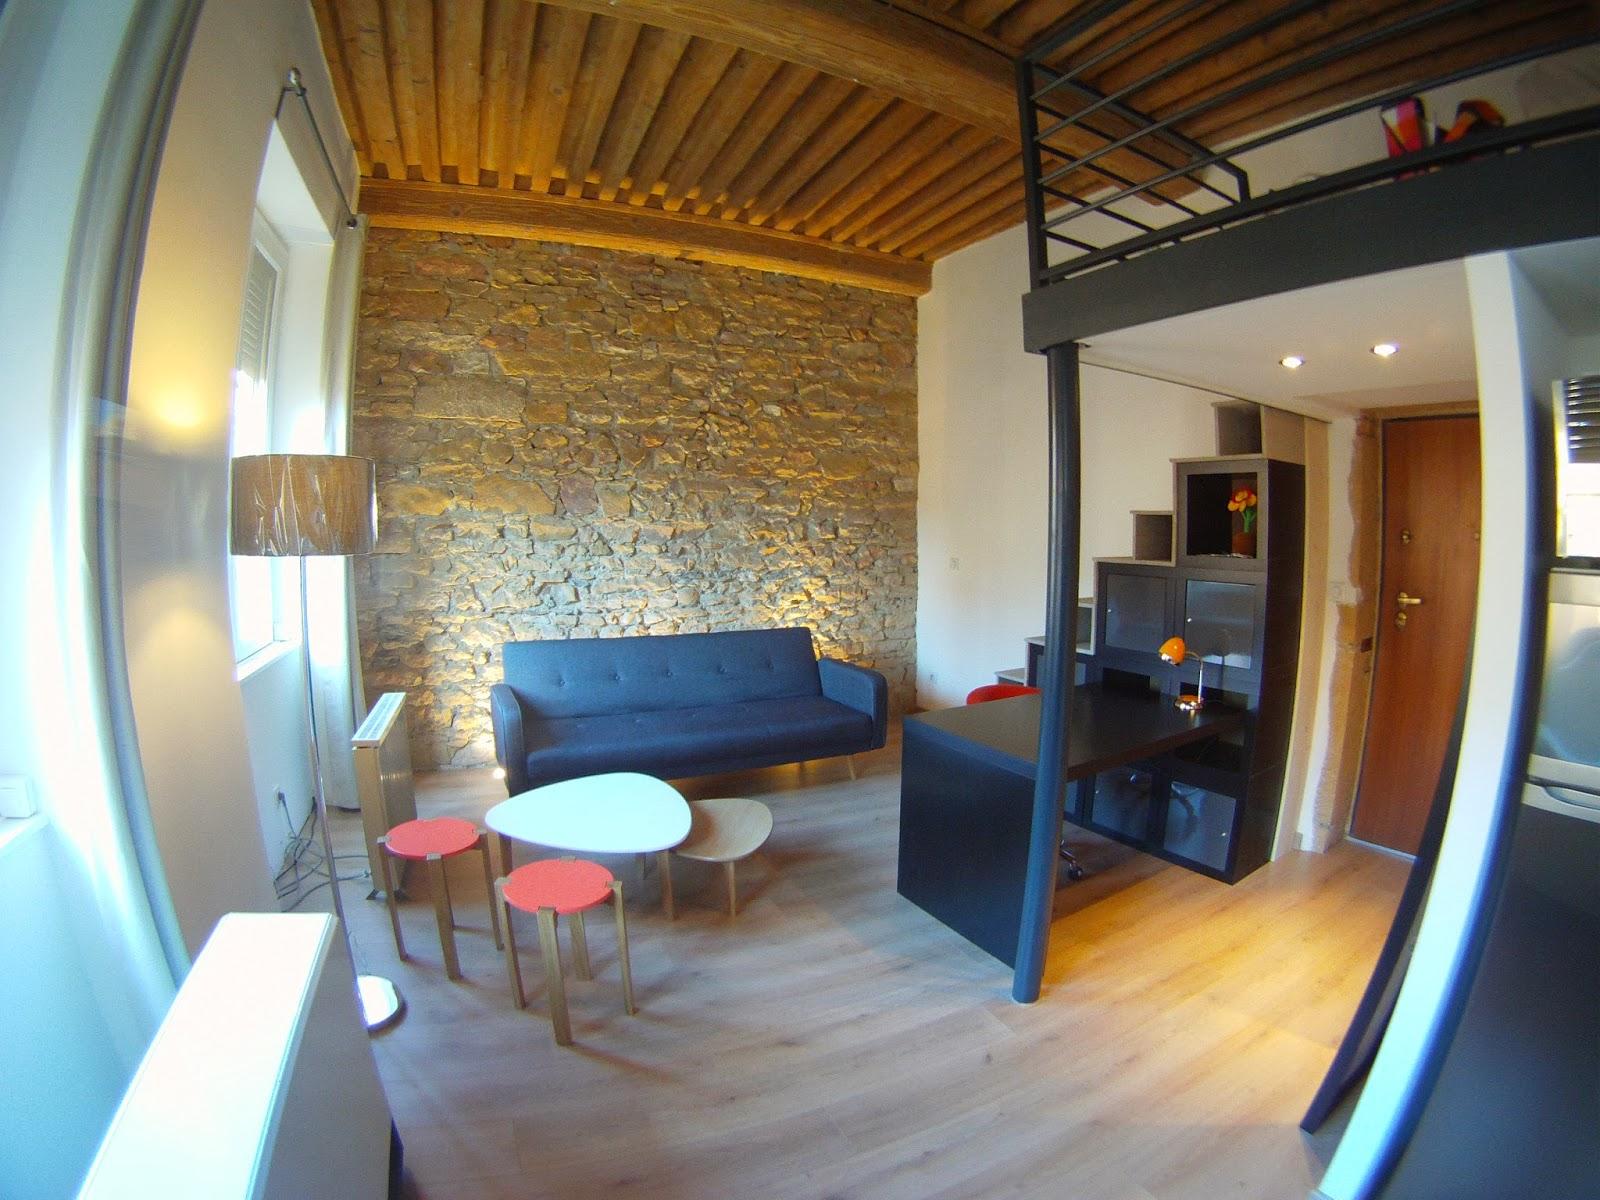 Indoordesign architecture d 39 int rieur lyon dumenge for Renovation canut